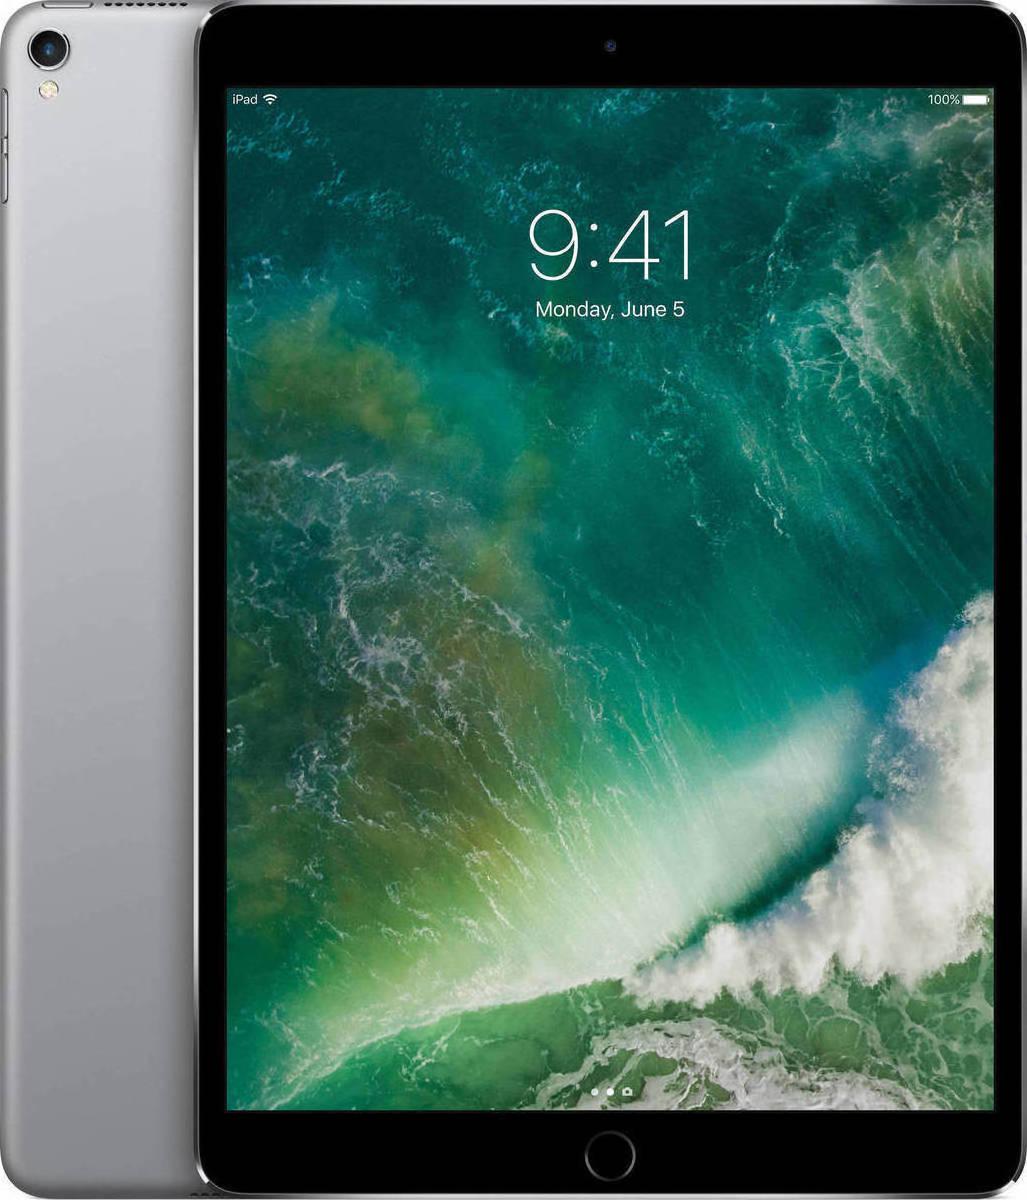 Apple iPad Pro 12.9'' 2017 WiFi and Cellular 512GB Space Grey Με Αντάπτορα Πληρωμή έως 24 δόσεις